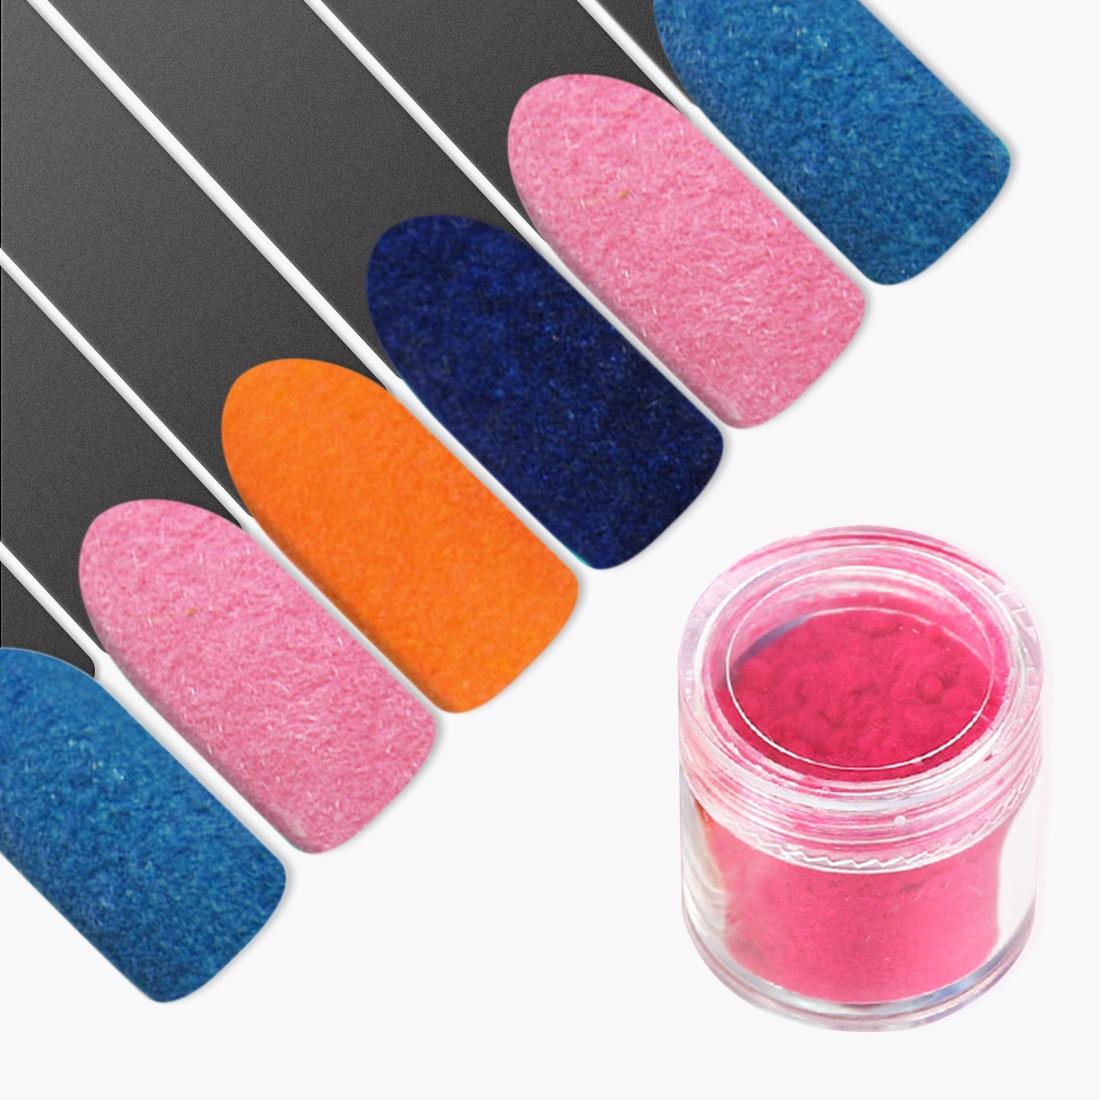 14 Colors Fuzzy Flocking Velvet Nail Glitter Powder Wine Colorful ...